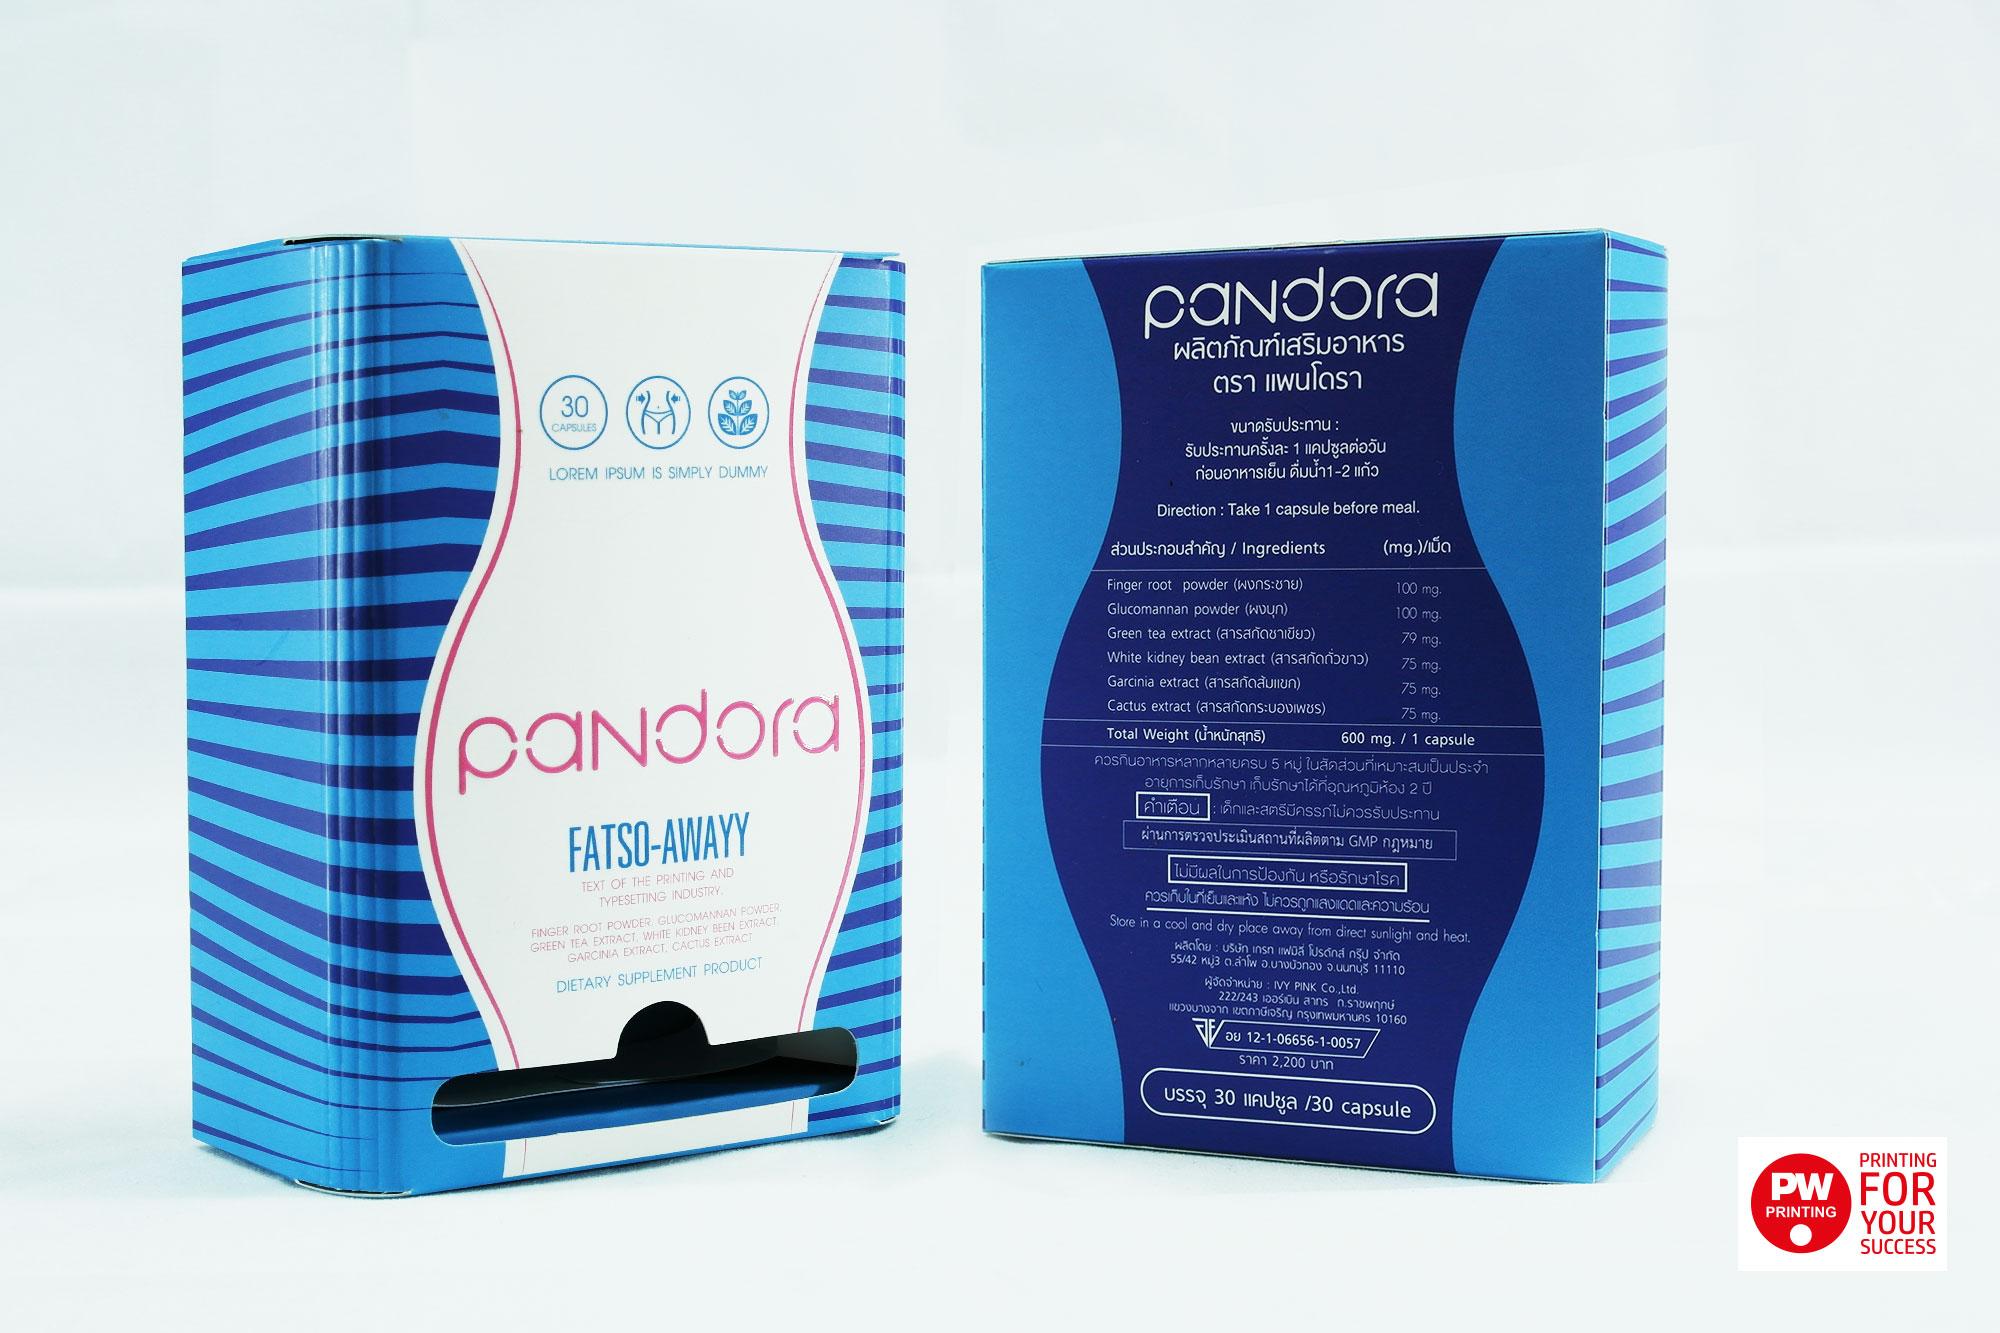 pandora Cosmetic Packaging Printing